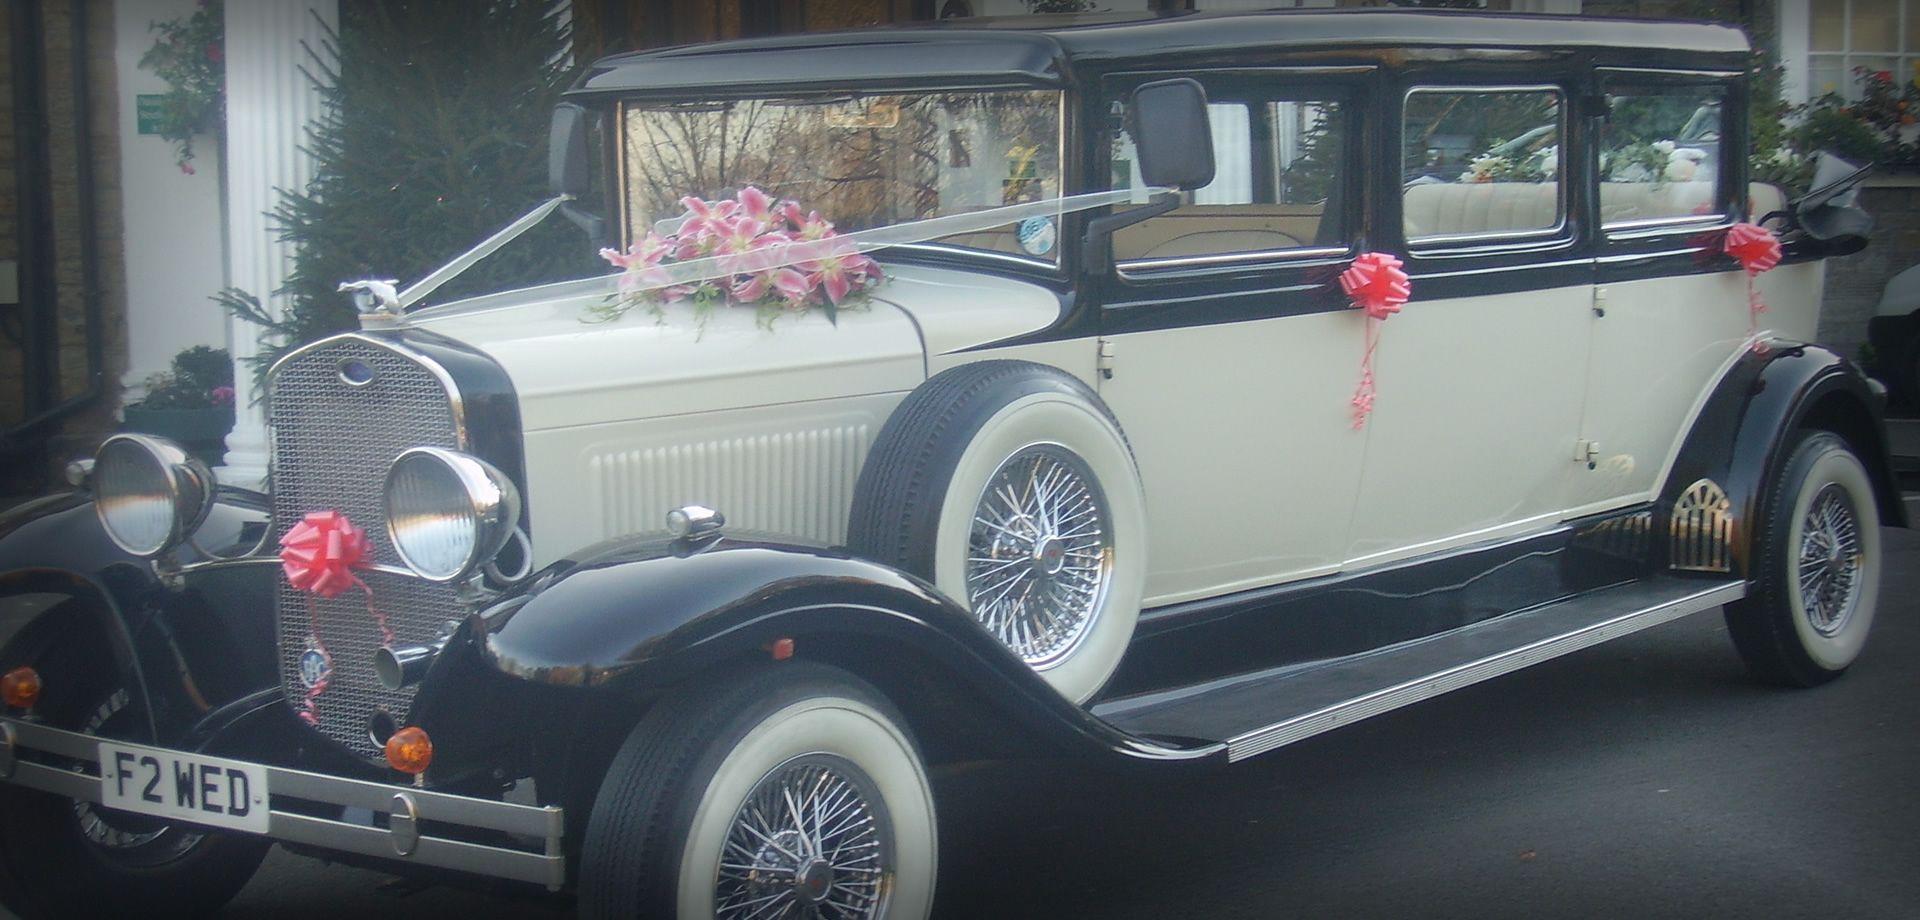 Wedding Car Hire Chesterfield Sheffield Derbyshire Regency Wedding Cars Wedding Car Wedding Car Hire Vintage Car Wedding